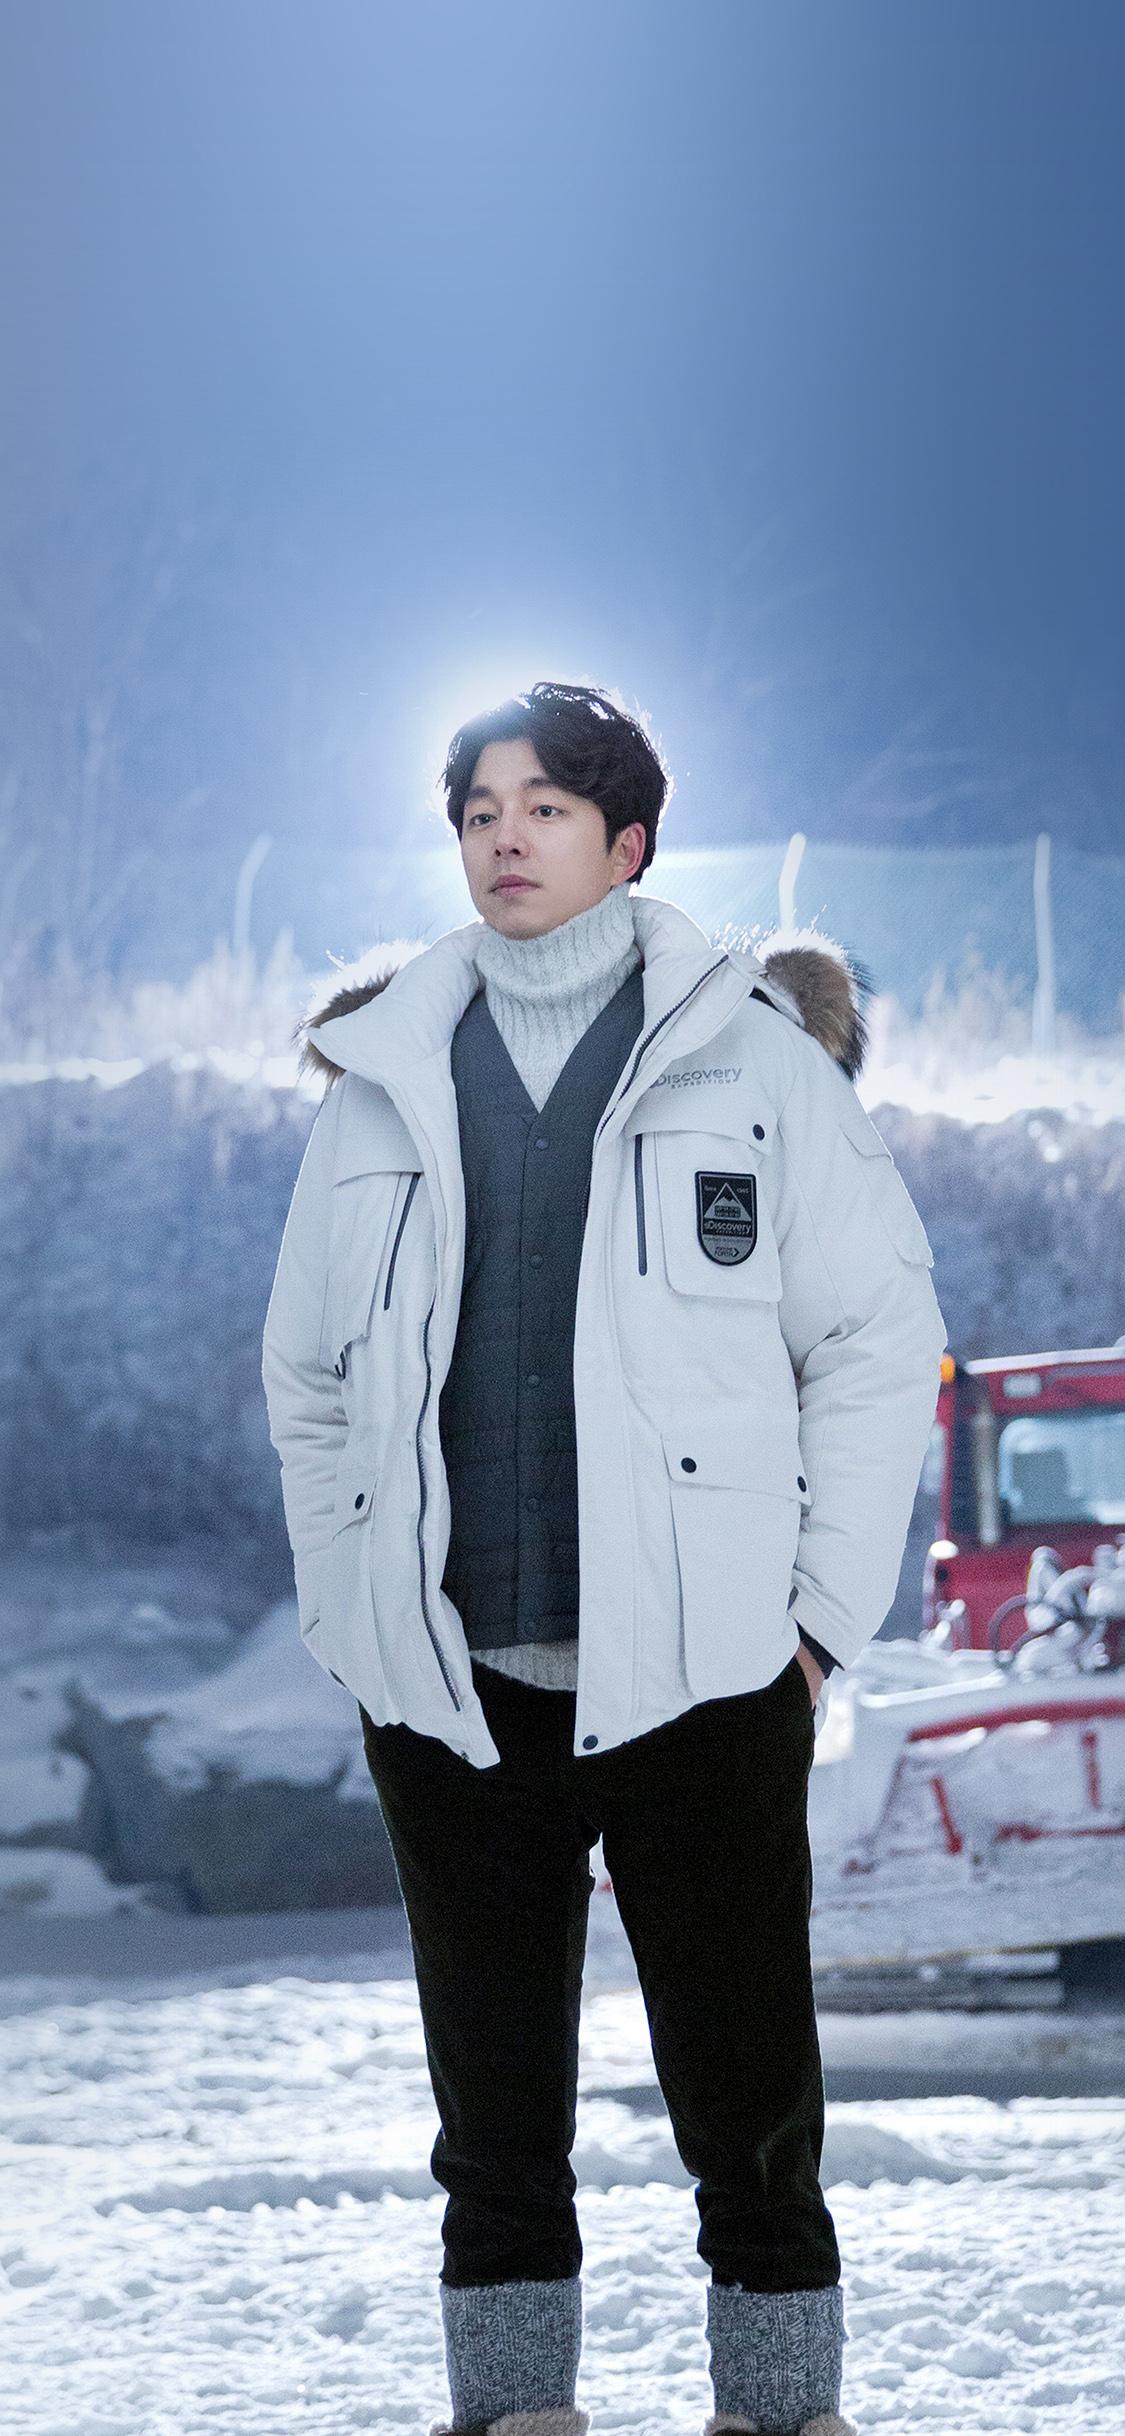 iPhoneXpapers.com-Apple-iPhone-wallpaper-hm23-kpop-gongyoo-winter-handsome-doggaebi